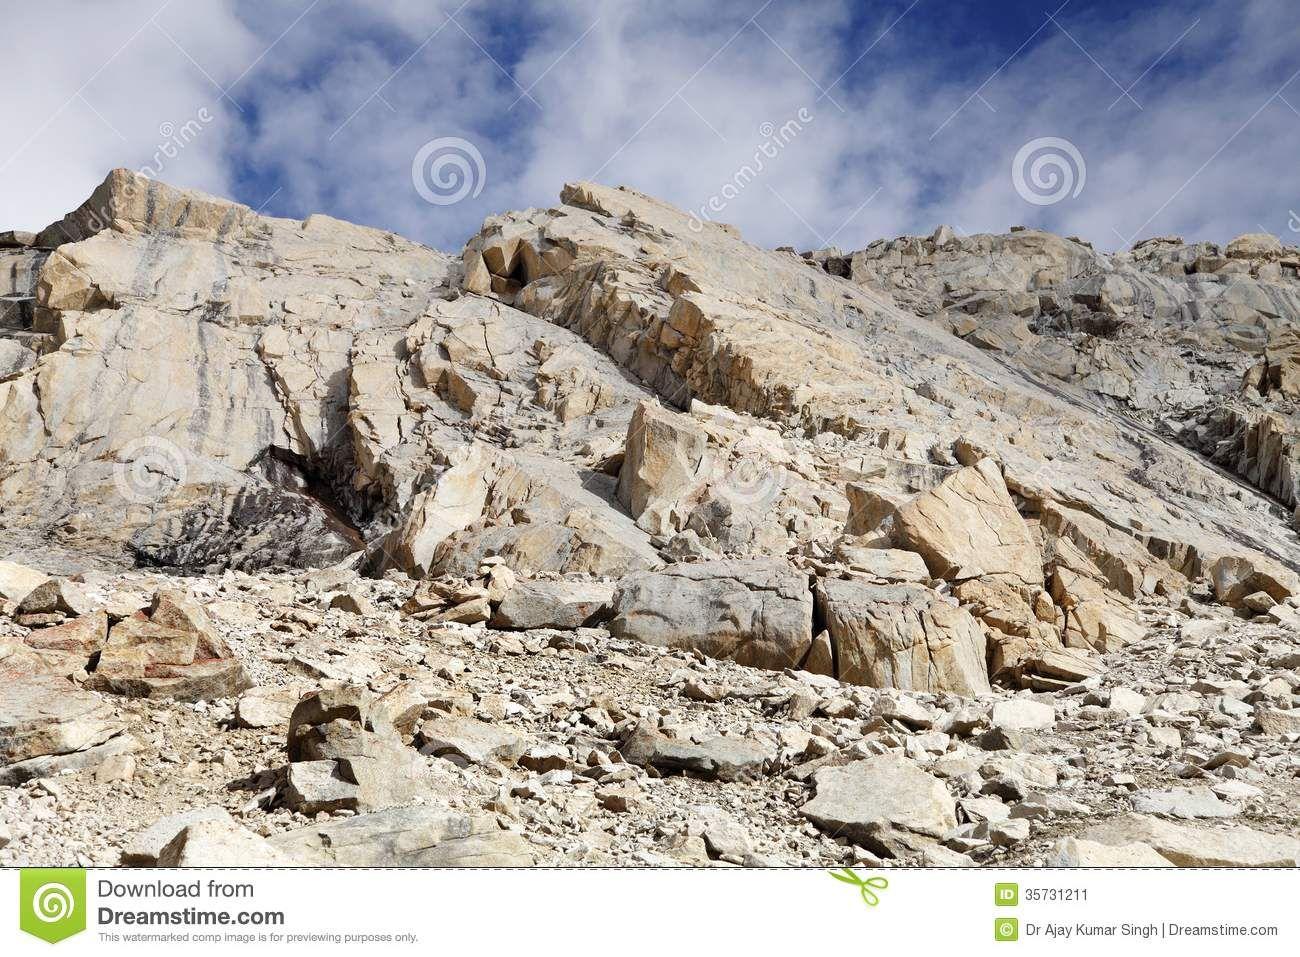 brittle-highly-fractured-granite-rocks-near-khardung-la-pass-beautiful-exposure-rock-structure-35731211.jpg (1300×957)